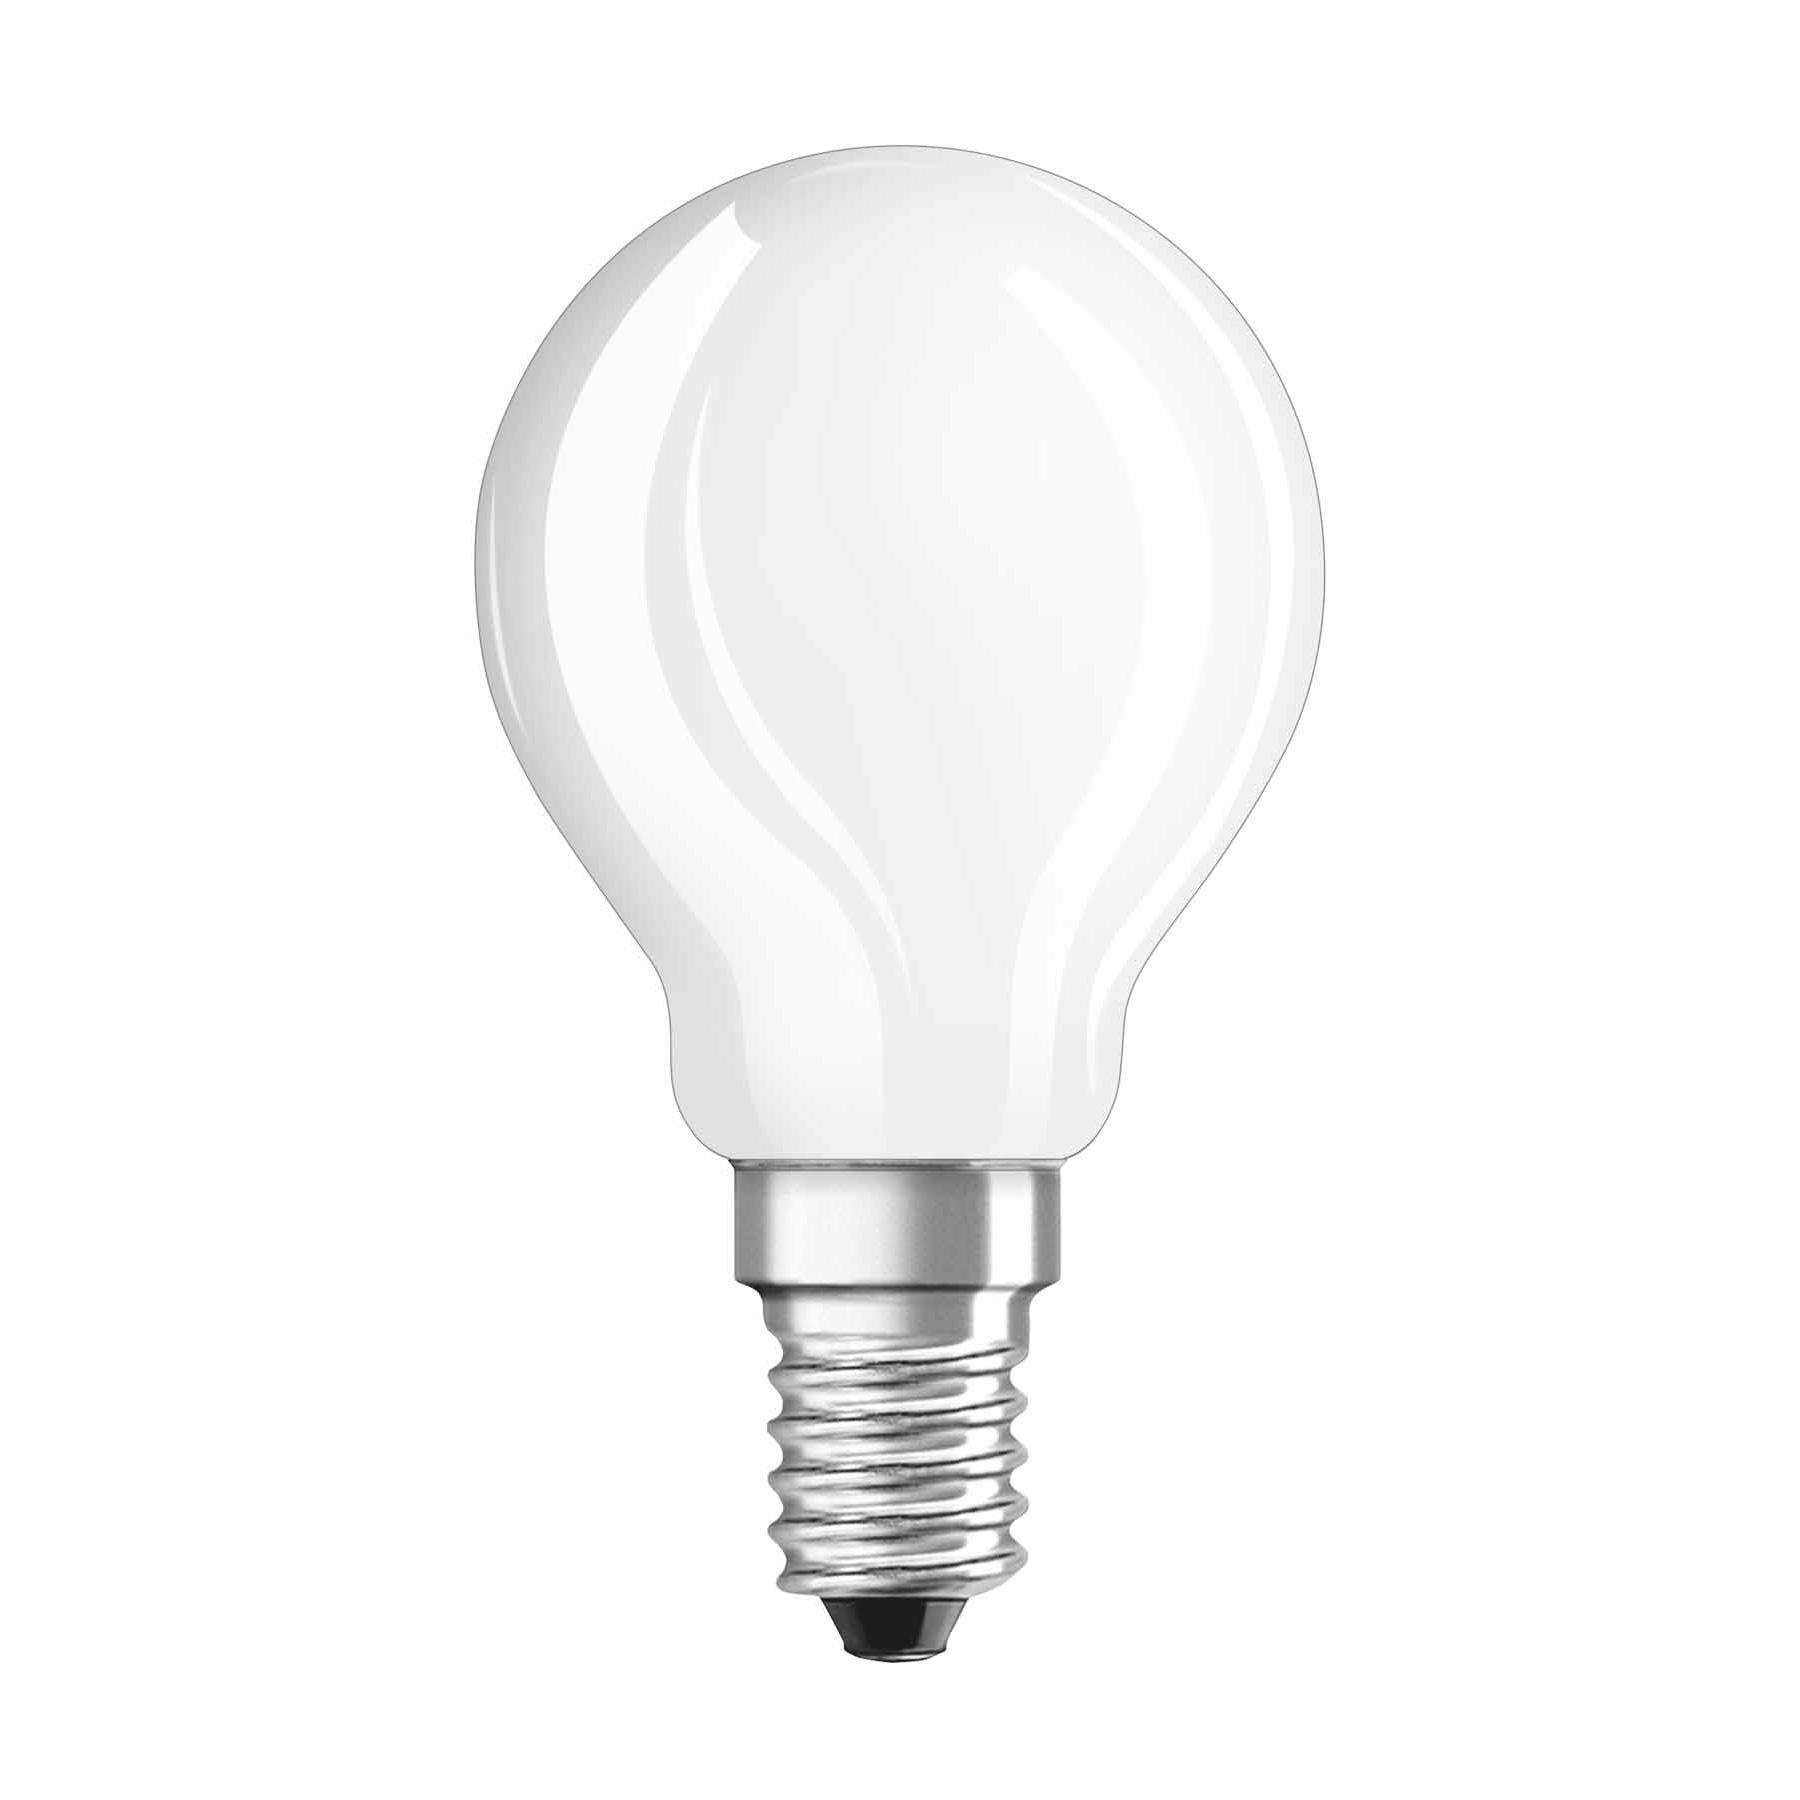 osram led retrofit filament clp 4052899936430 reuter onlineshop. Black Bedroom Furniture Sets. Home Design Ideas